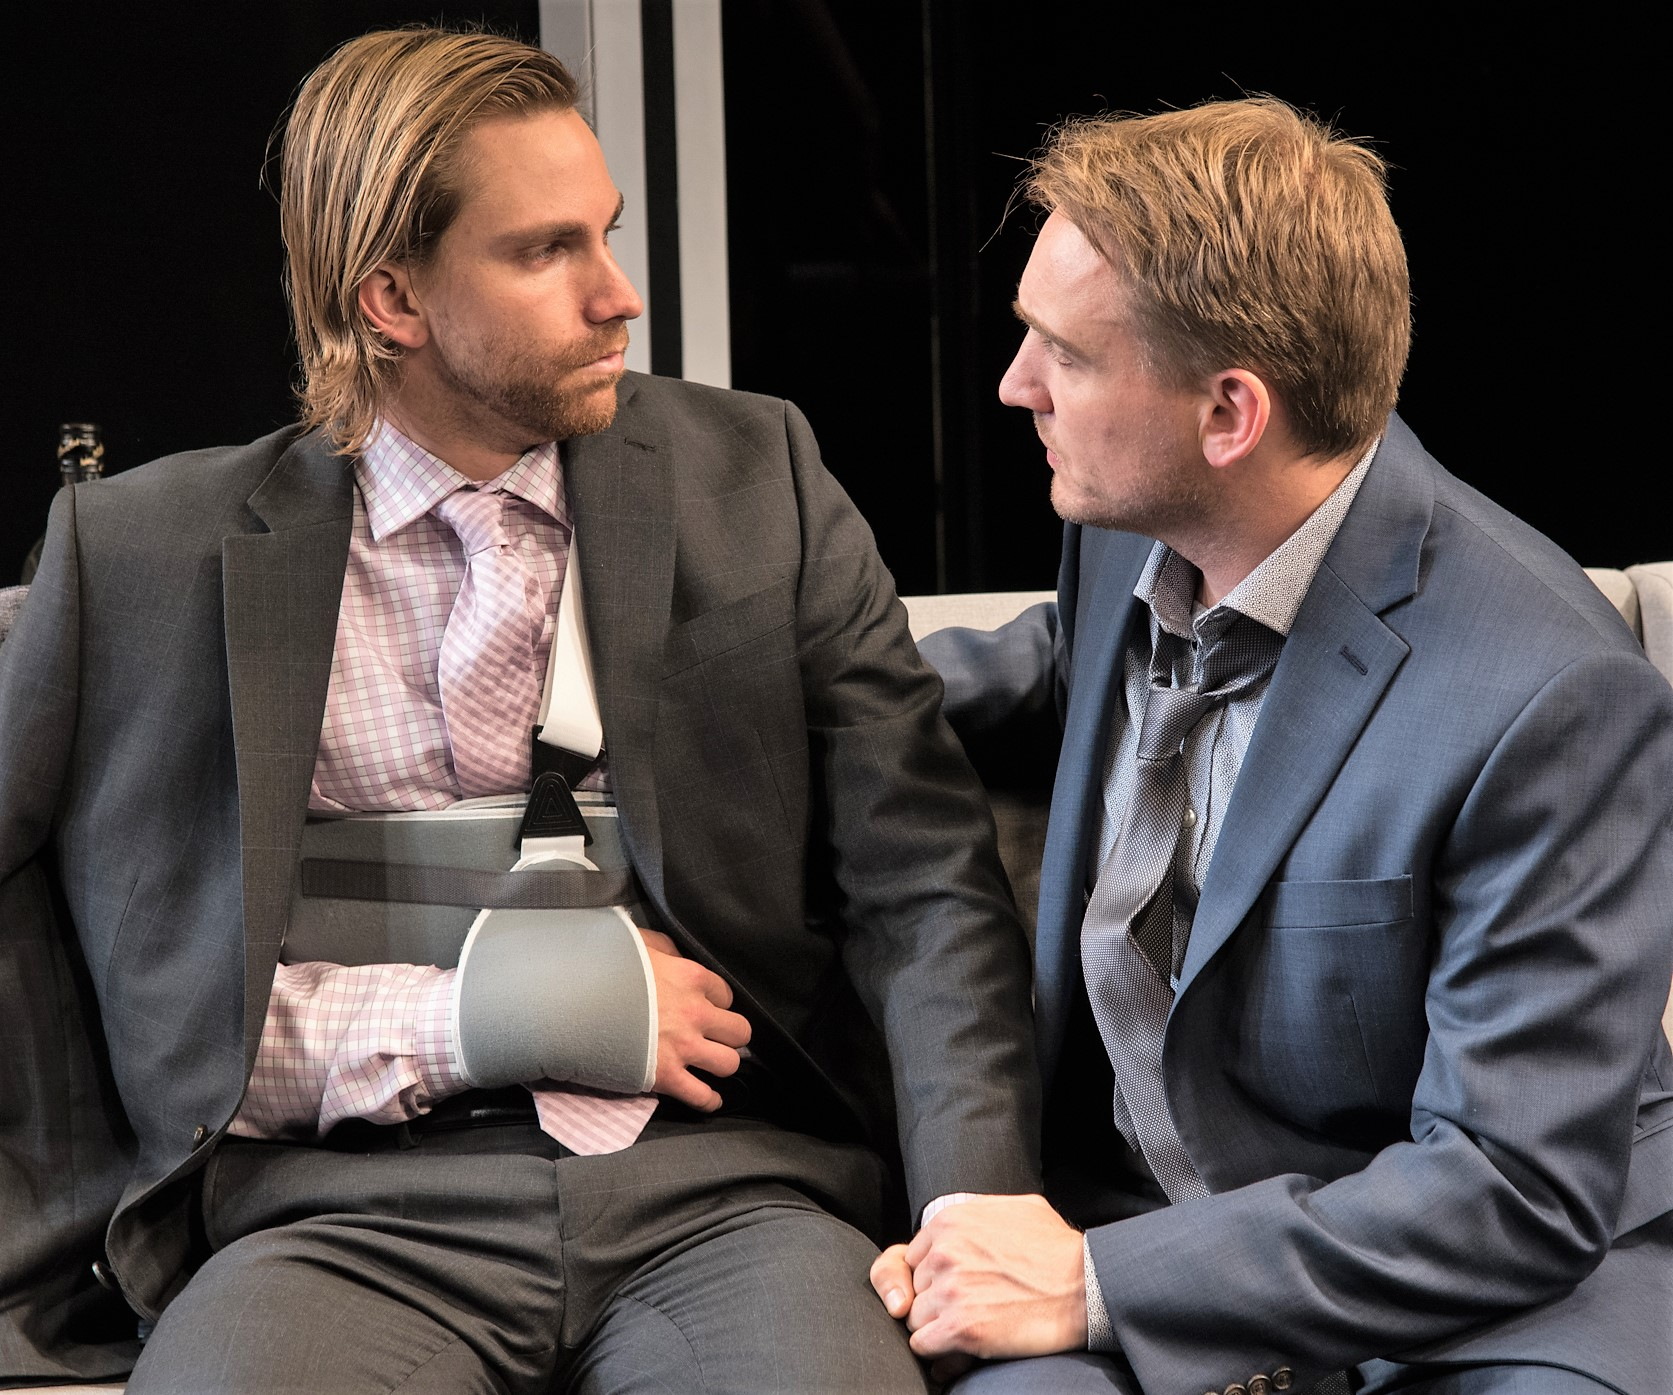 Jim Jr. and his partner Kris (Alec Shaw, left) share a moment.